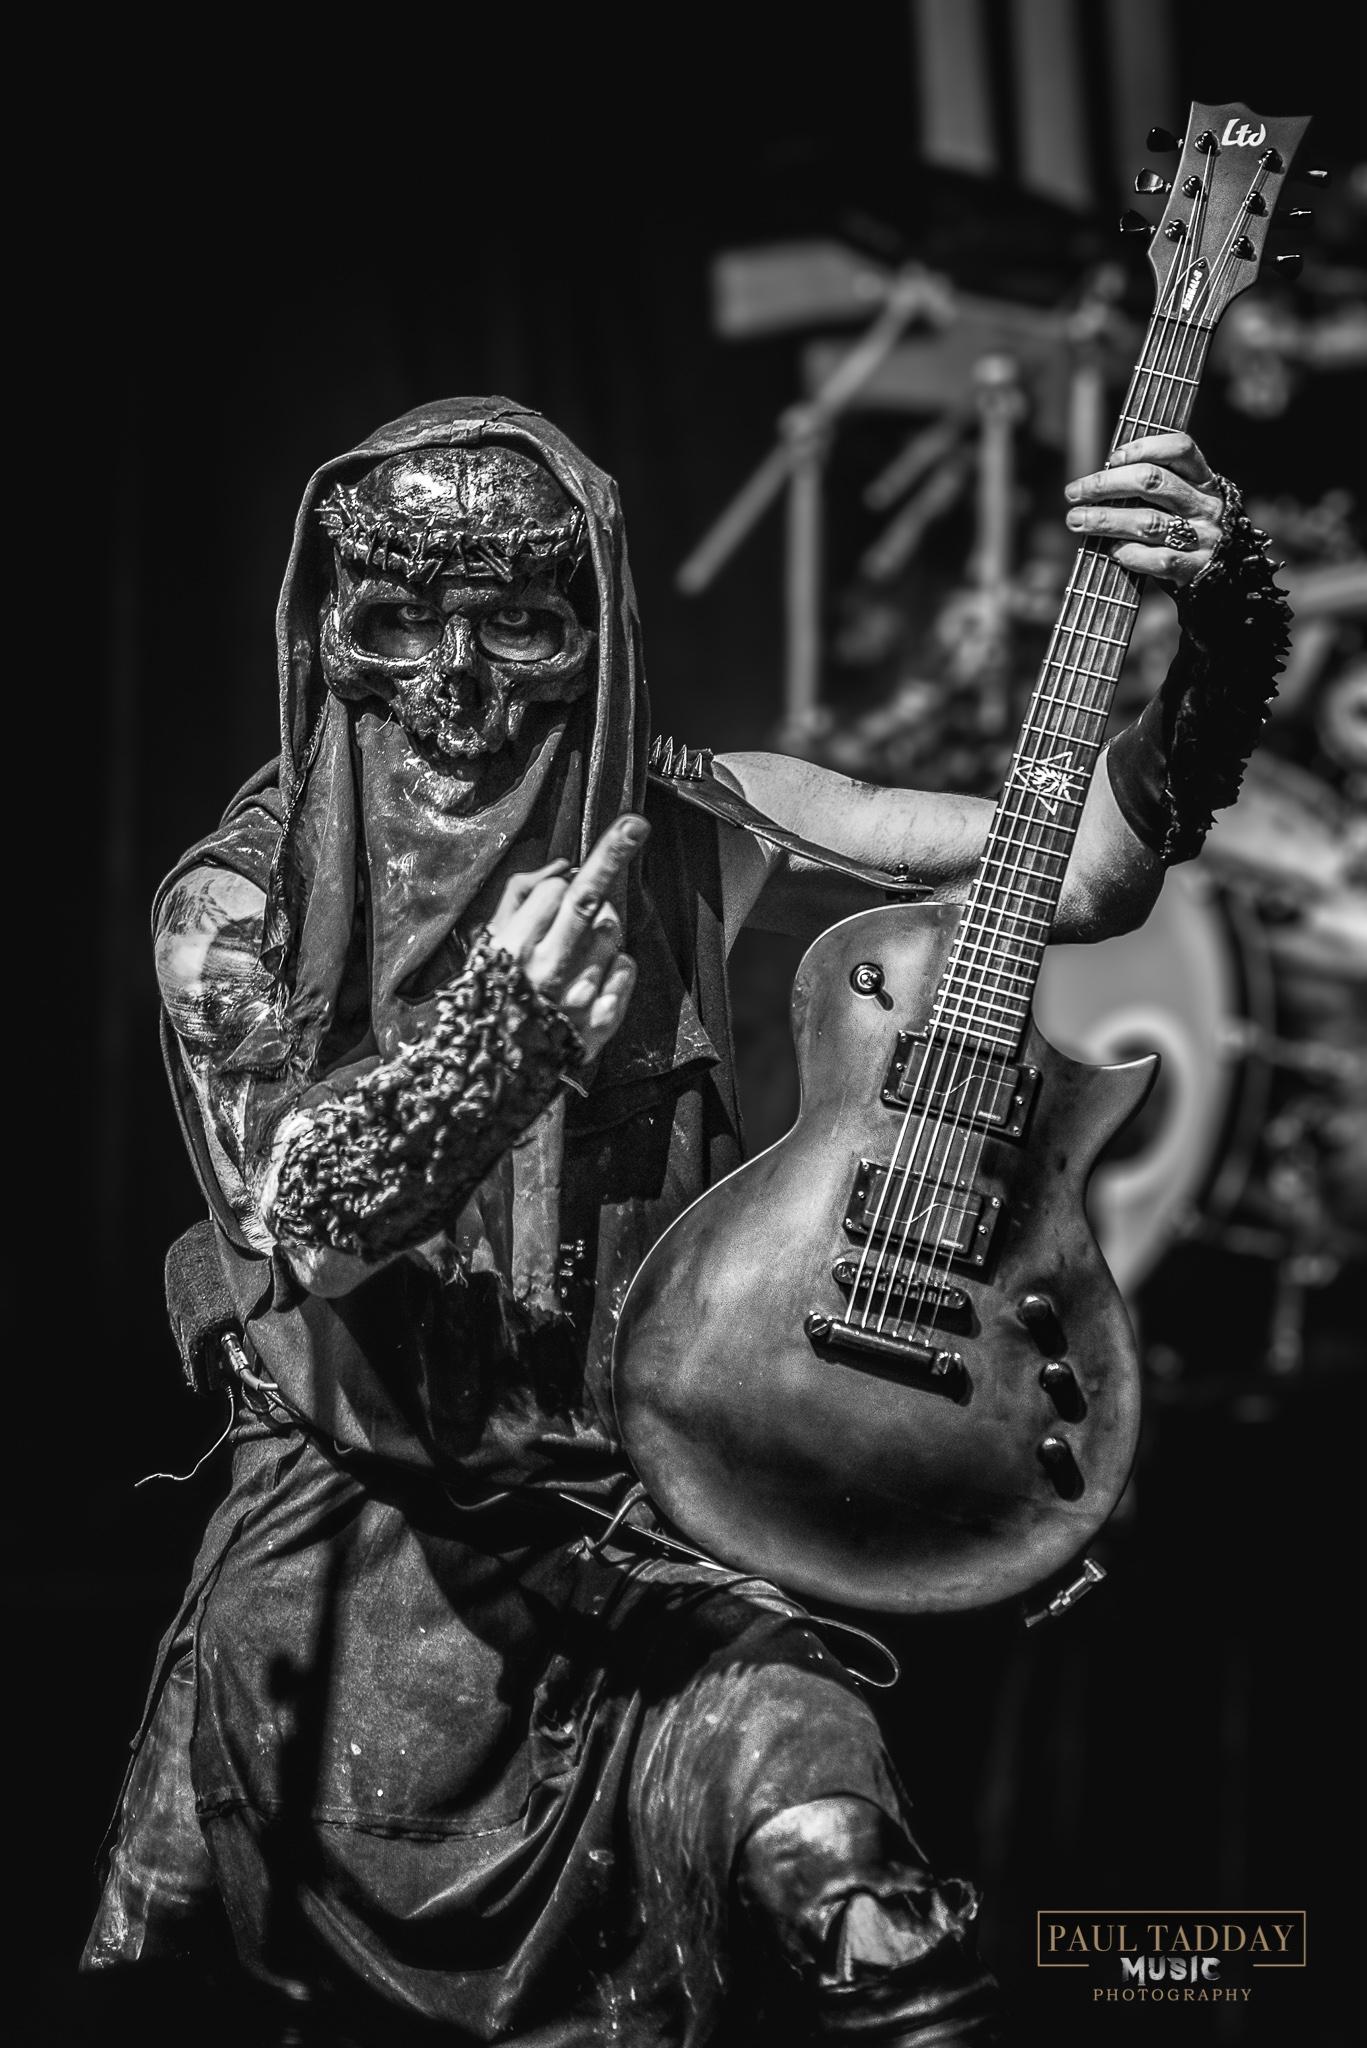 behemoth - brisbane - march 7 2019 - web - paul tadday photography - 24.jpg